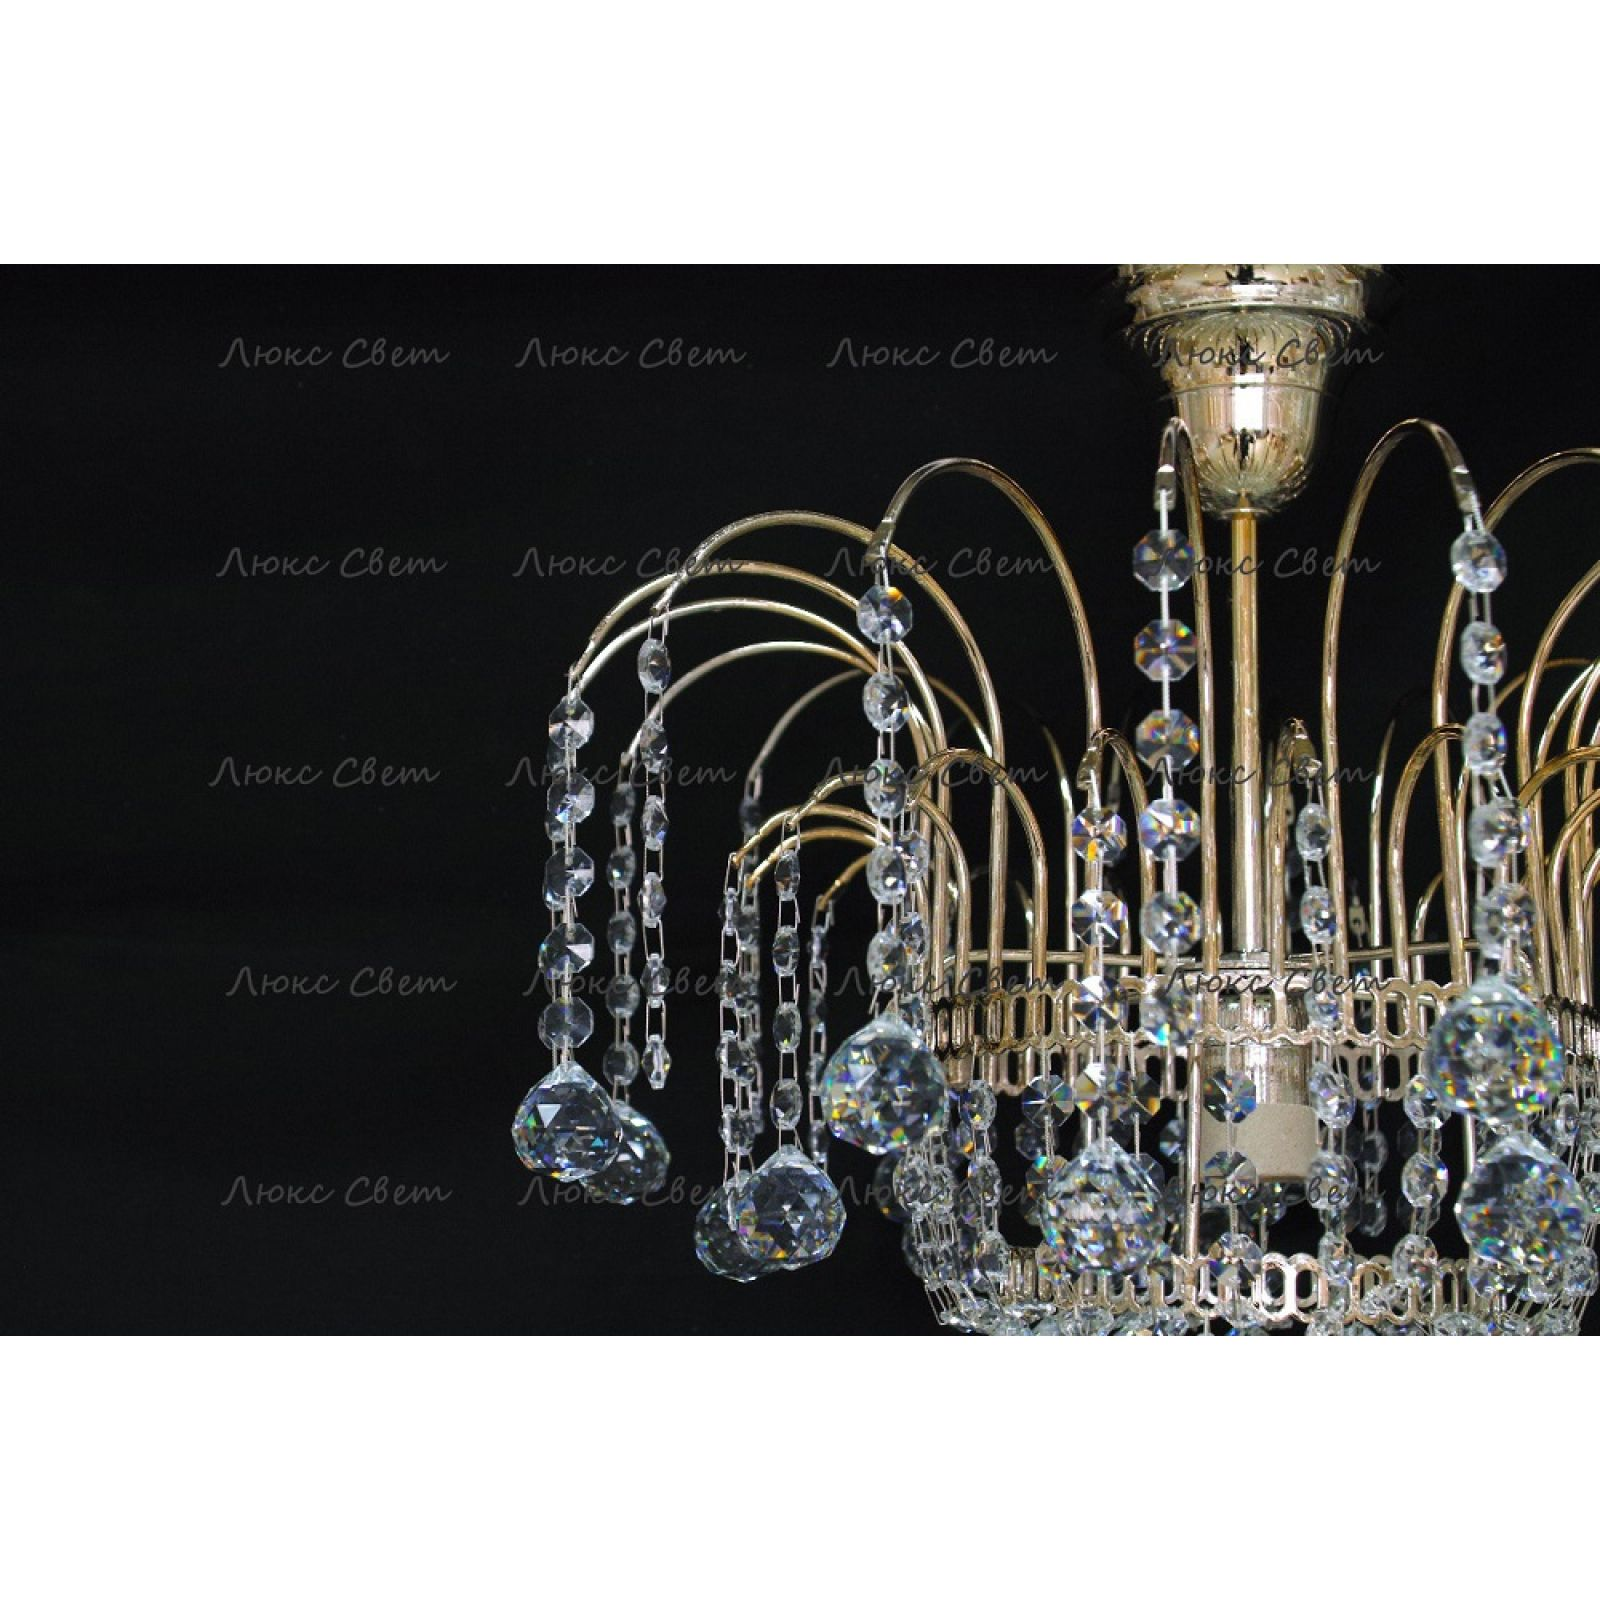 Люстра Акация № 5 - 1 лампа подвесная